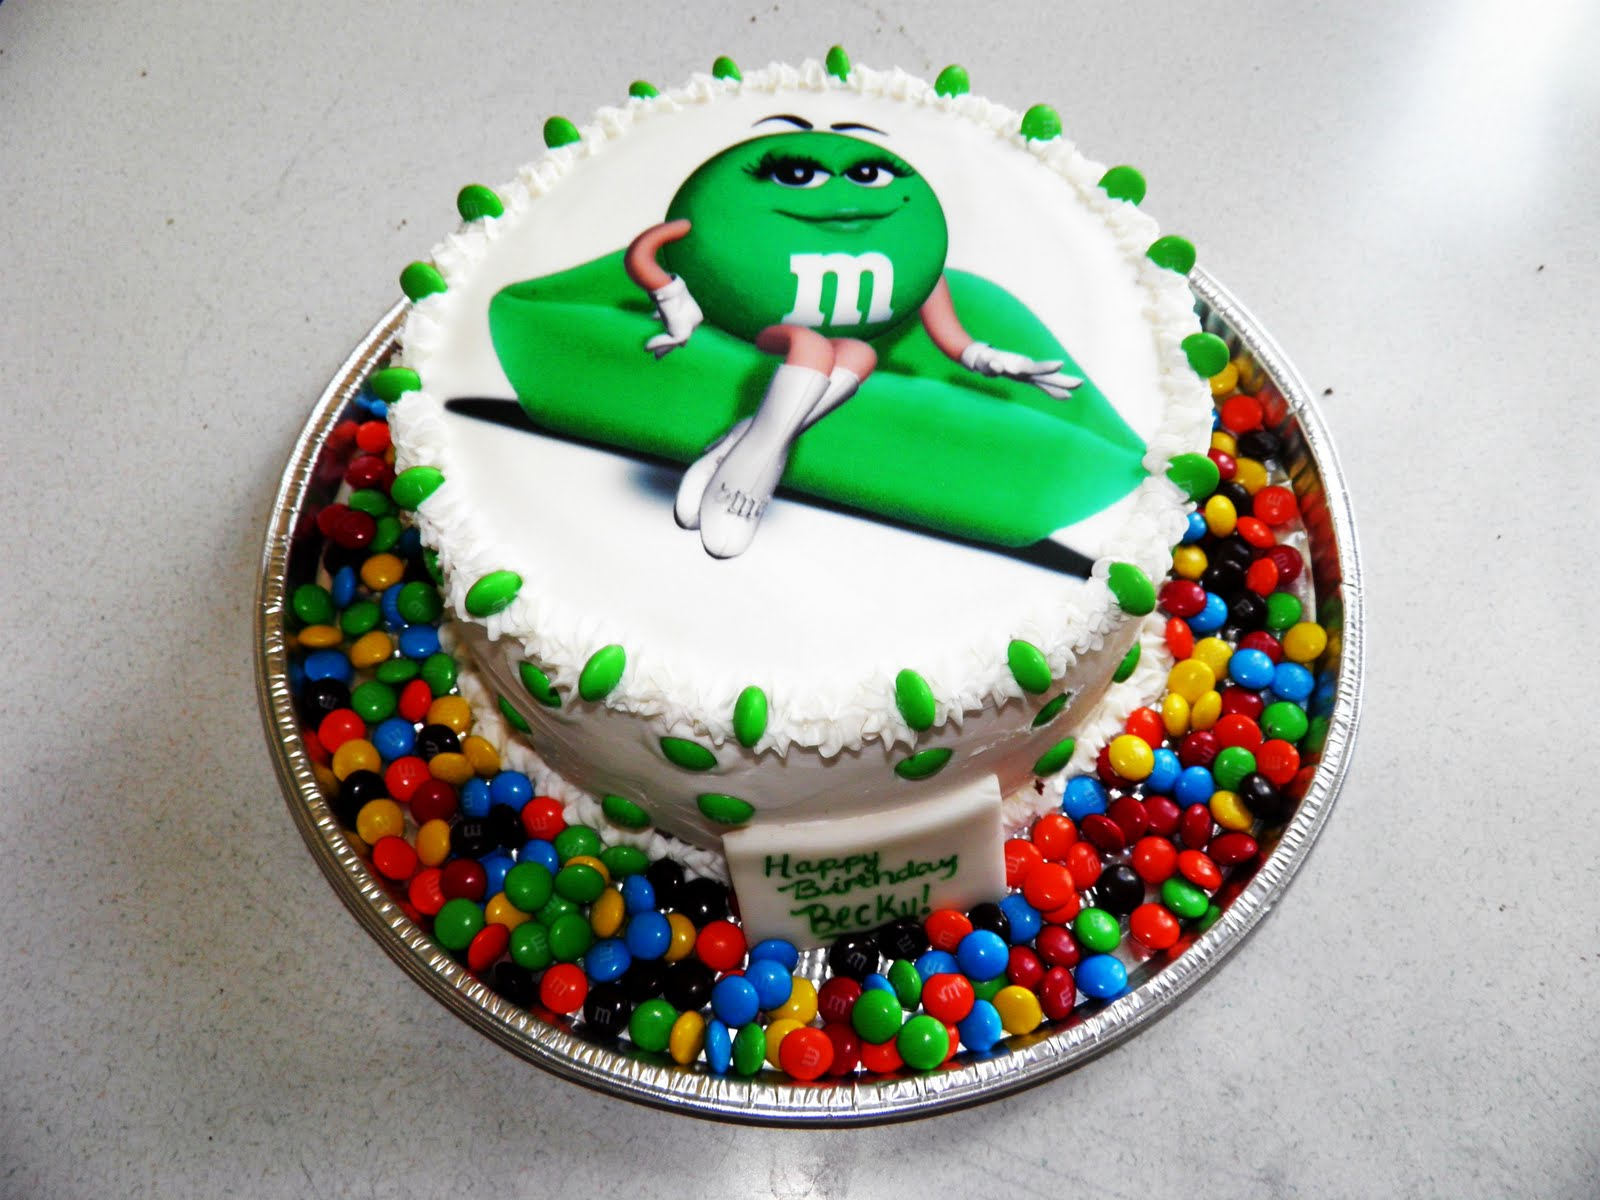 Green MM Cake